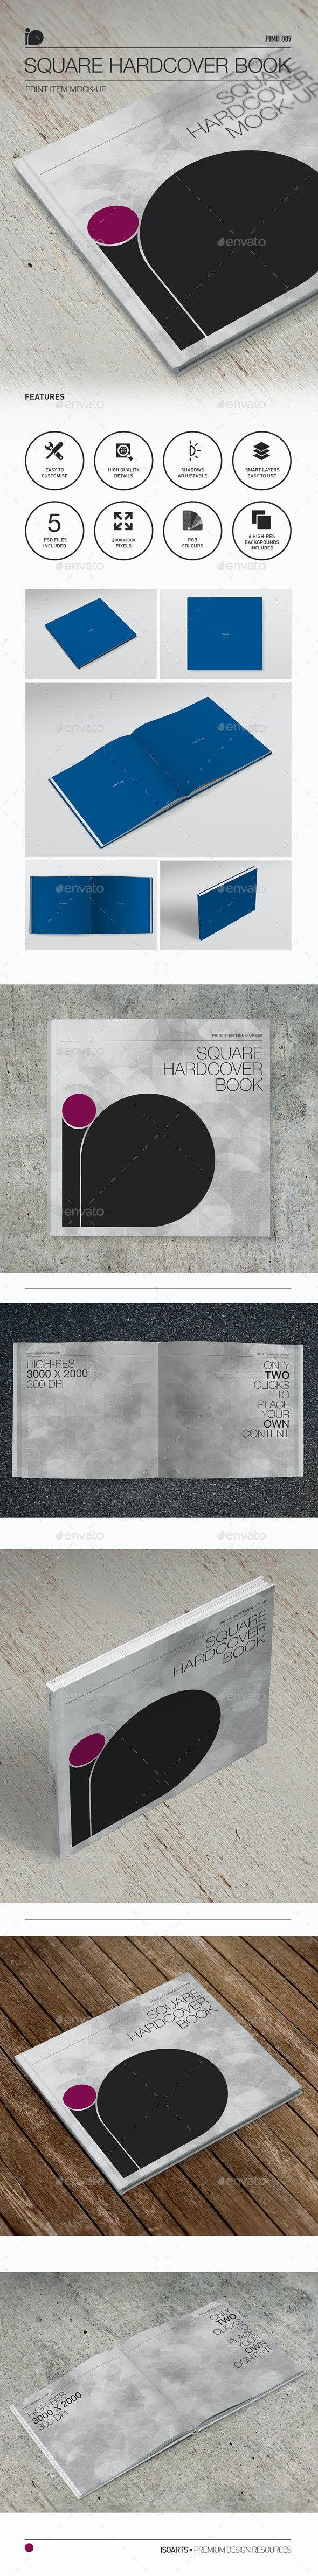 Mock-Up • Square Hardcover Book - Books Print